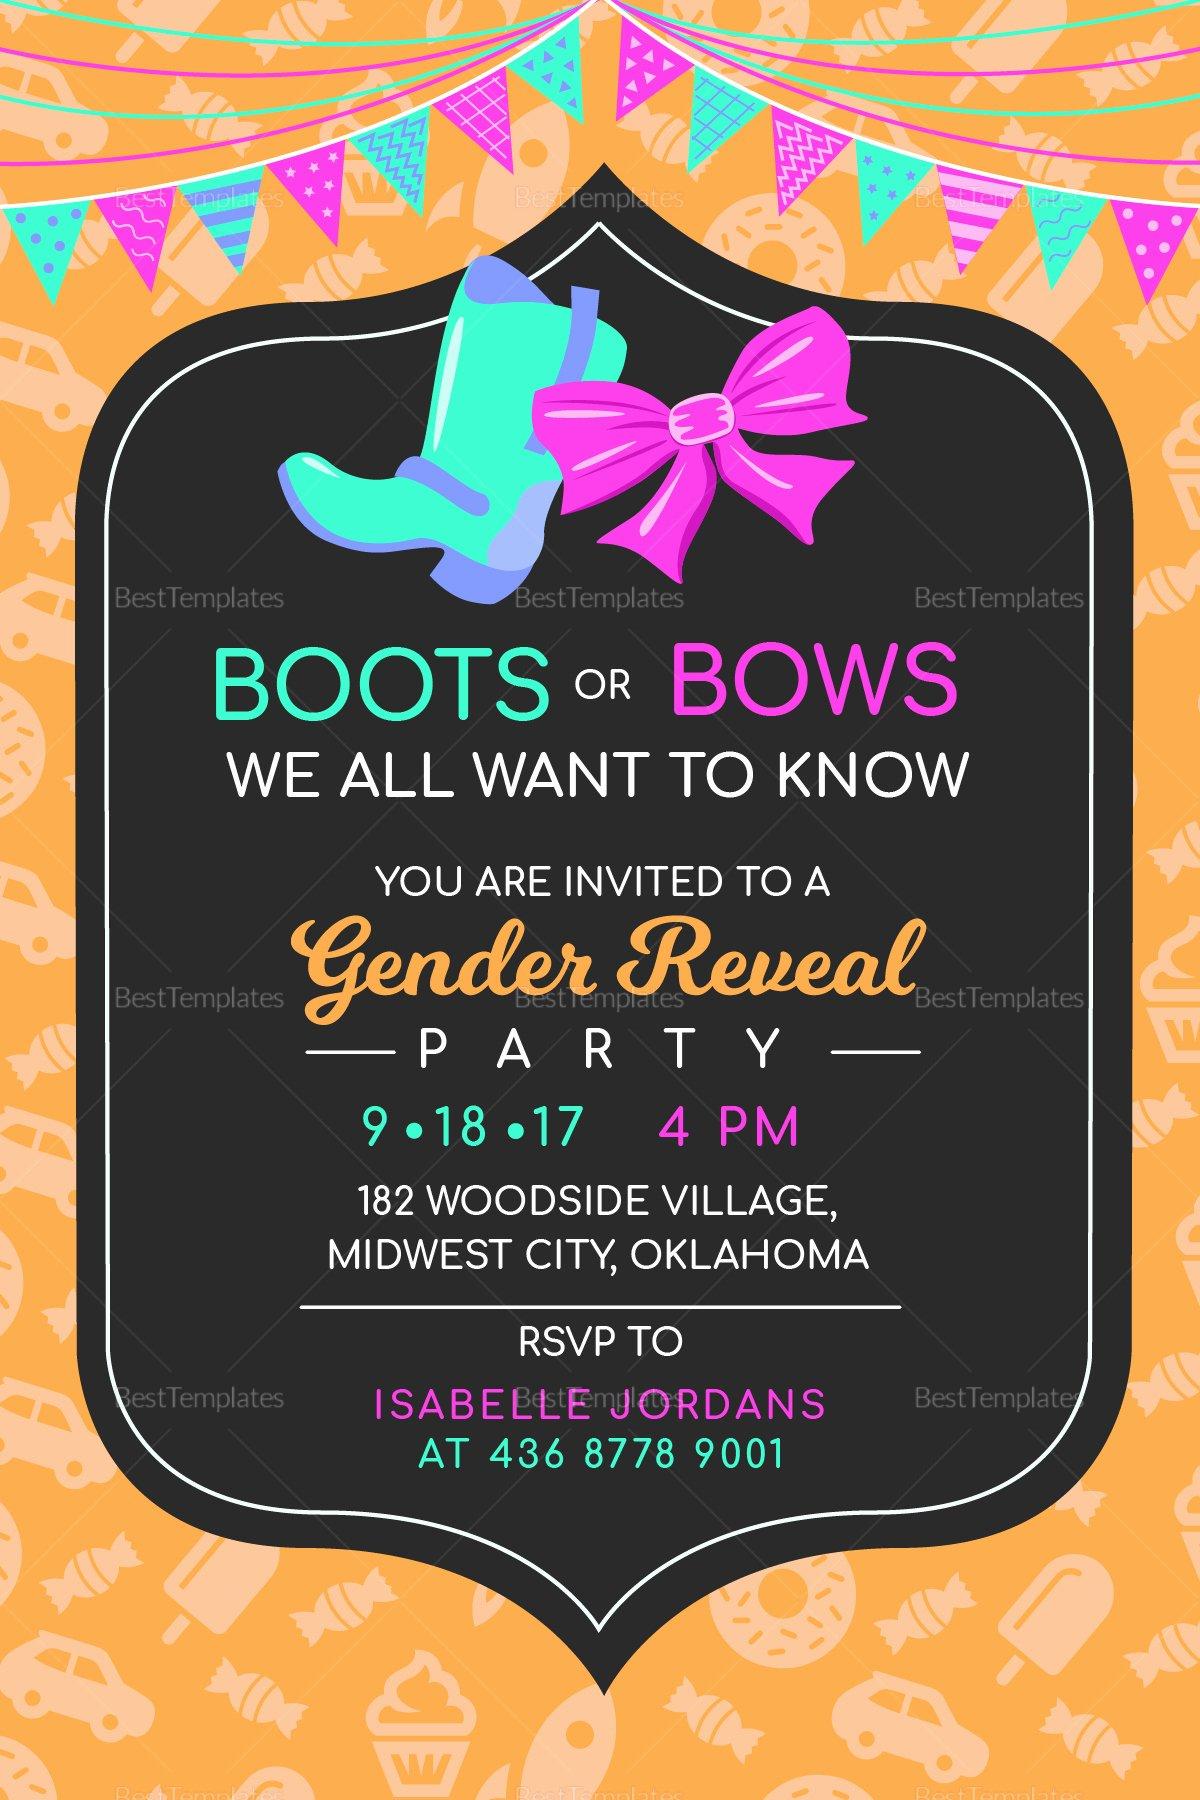 Gender Reveal Invitation Template Inspirational Boots or Bows Gender Reveal Invitation Design Template In